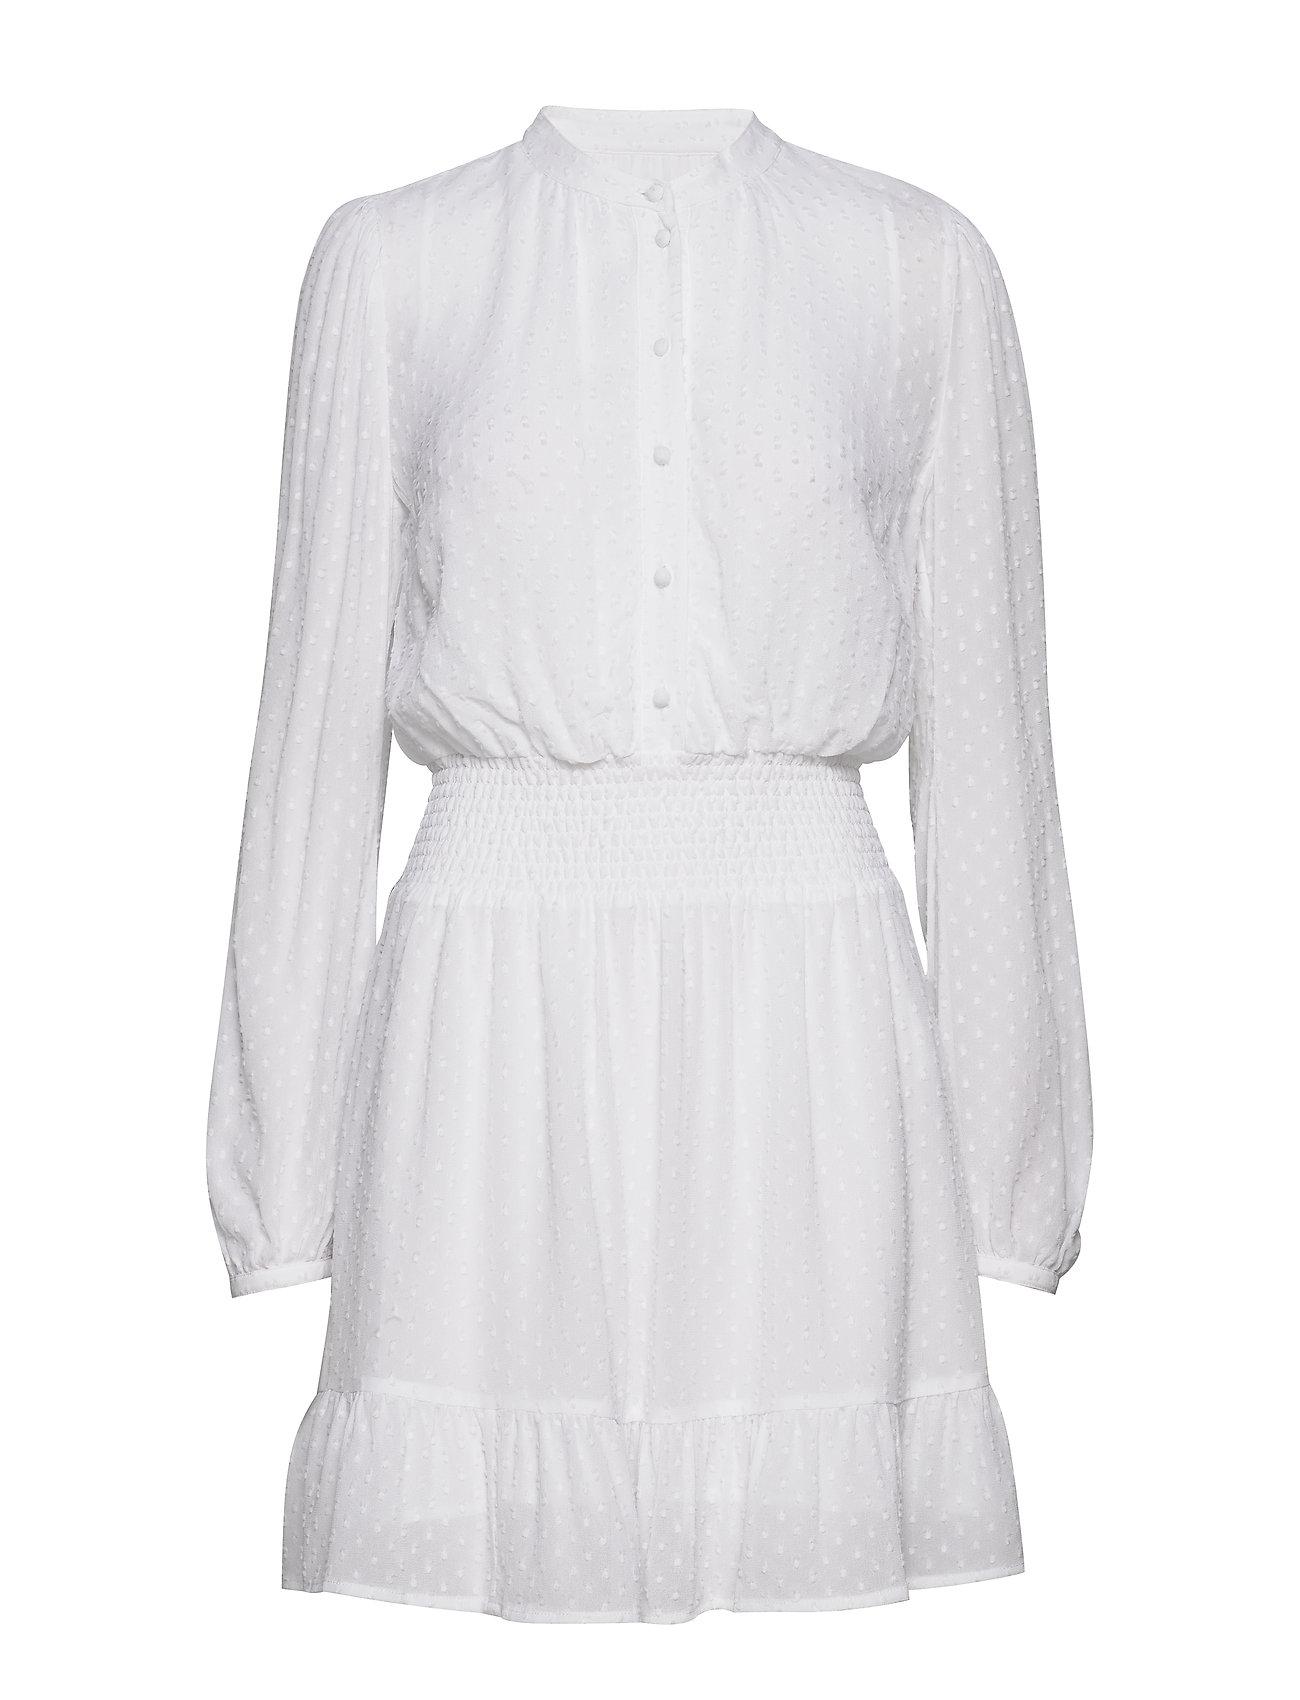 Michael Kors CLIP DOTS JQD DRESS - WHITE